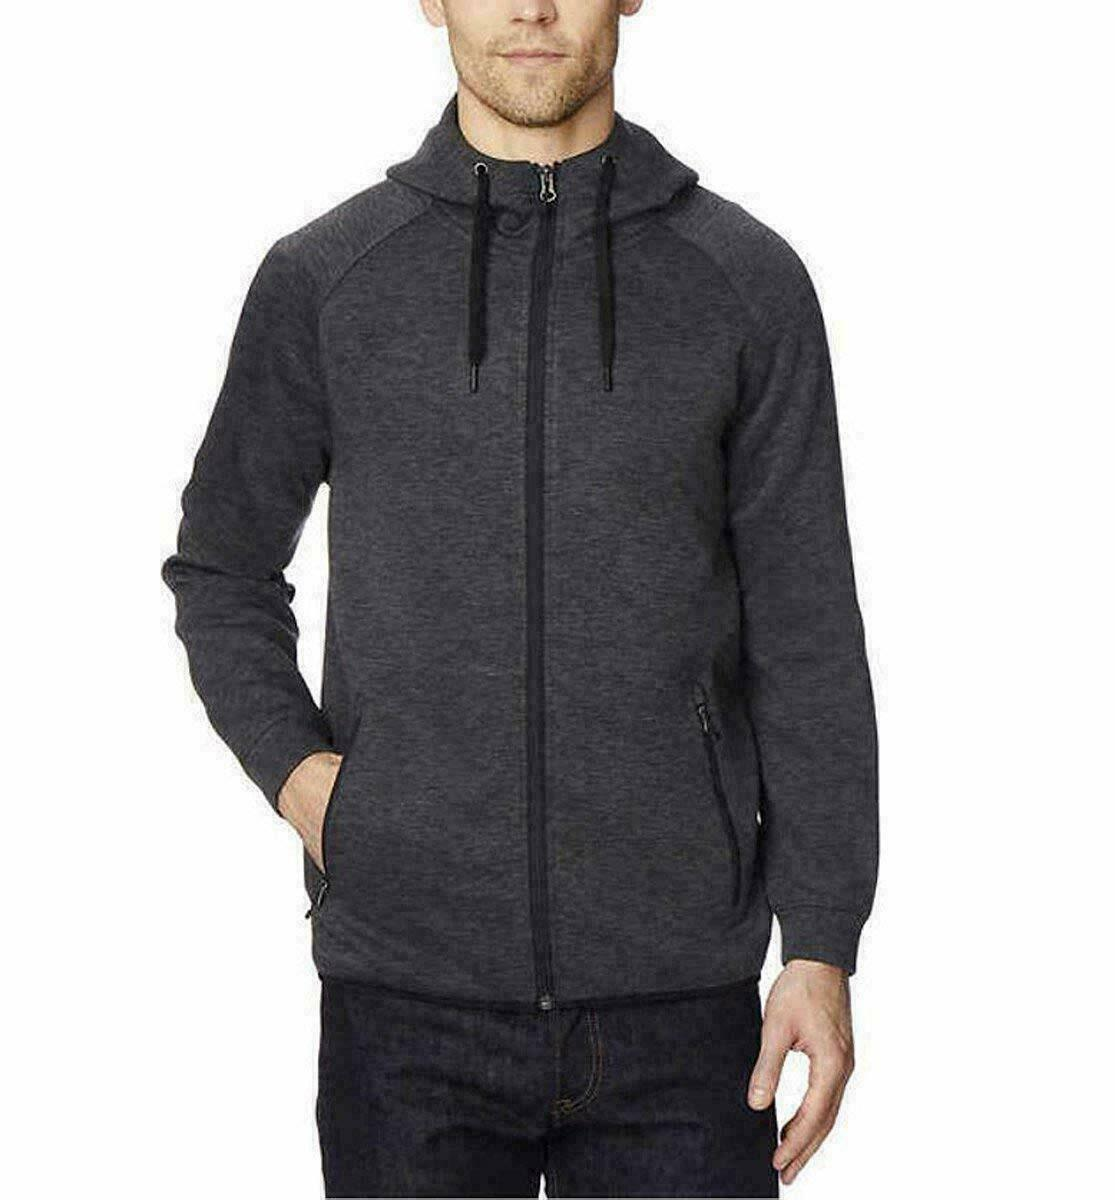 32 Degrees Men's Gray Tech Fleece Full Zip Hoodie Sweatshirt XL X-Large NWT